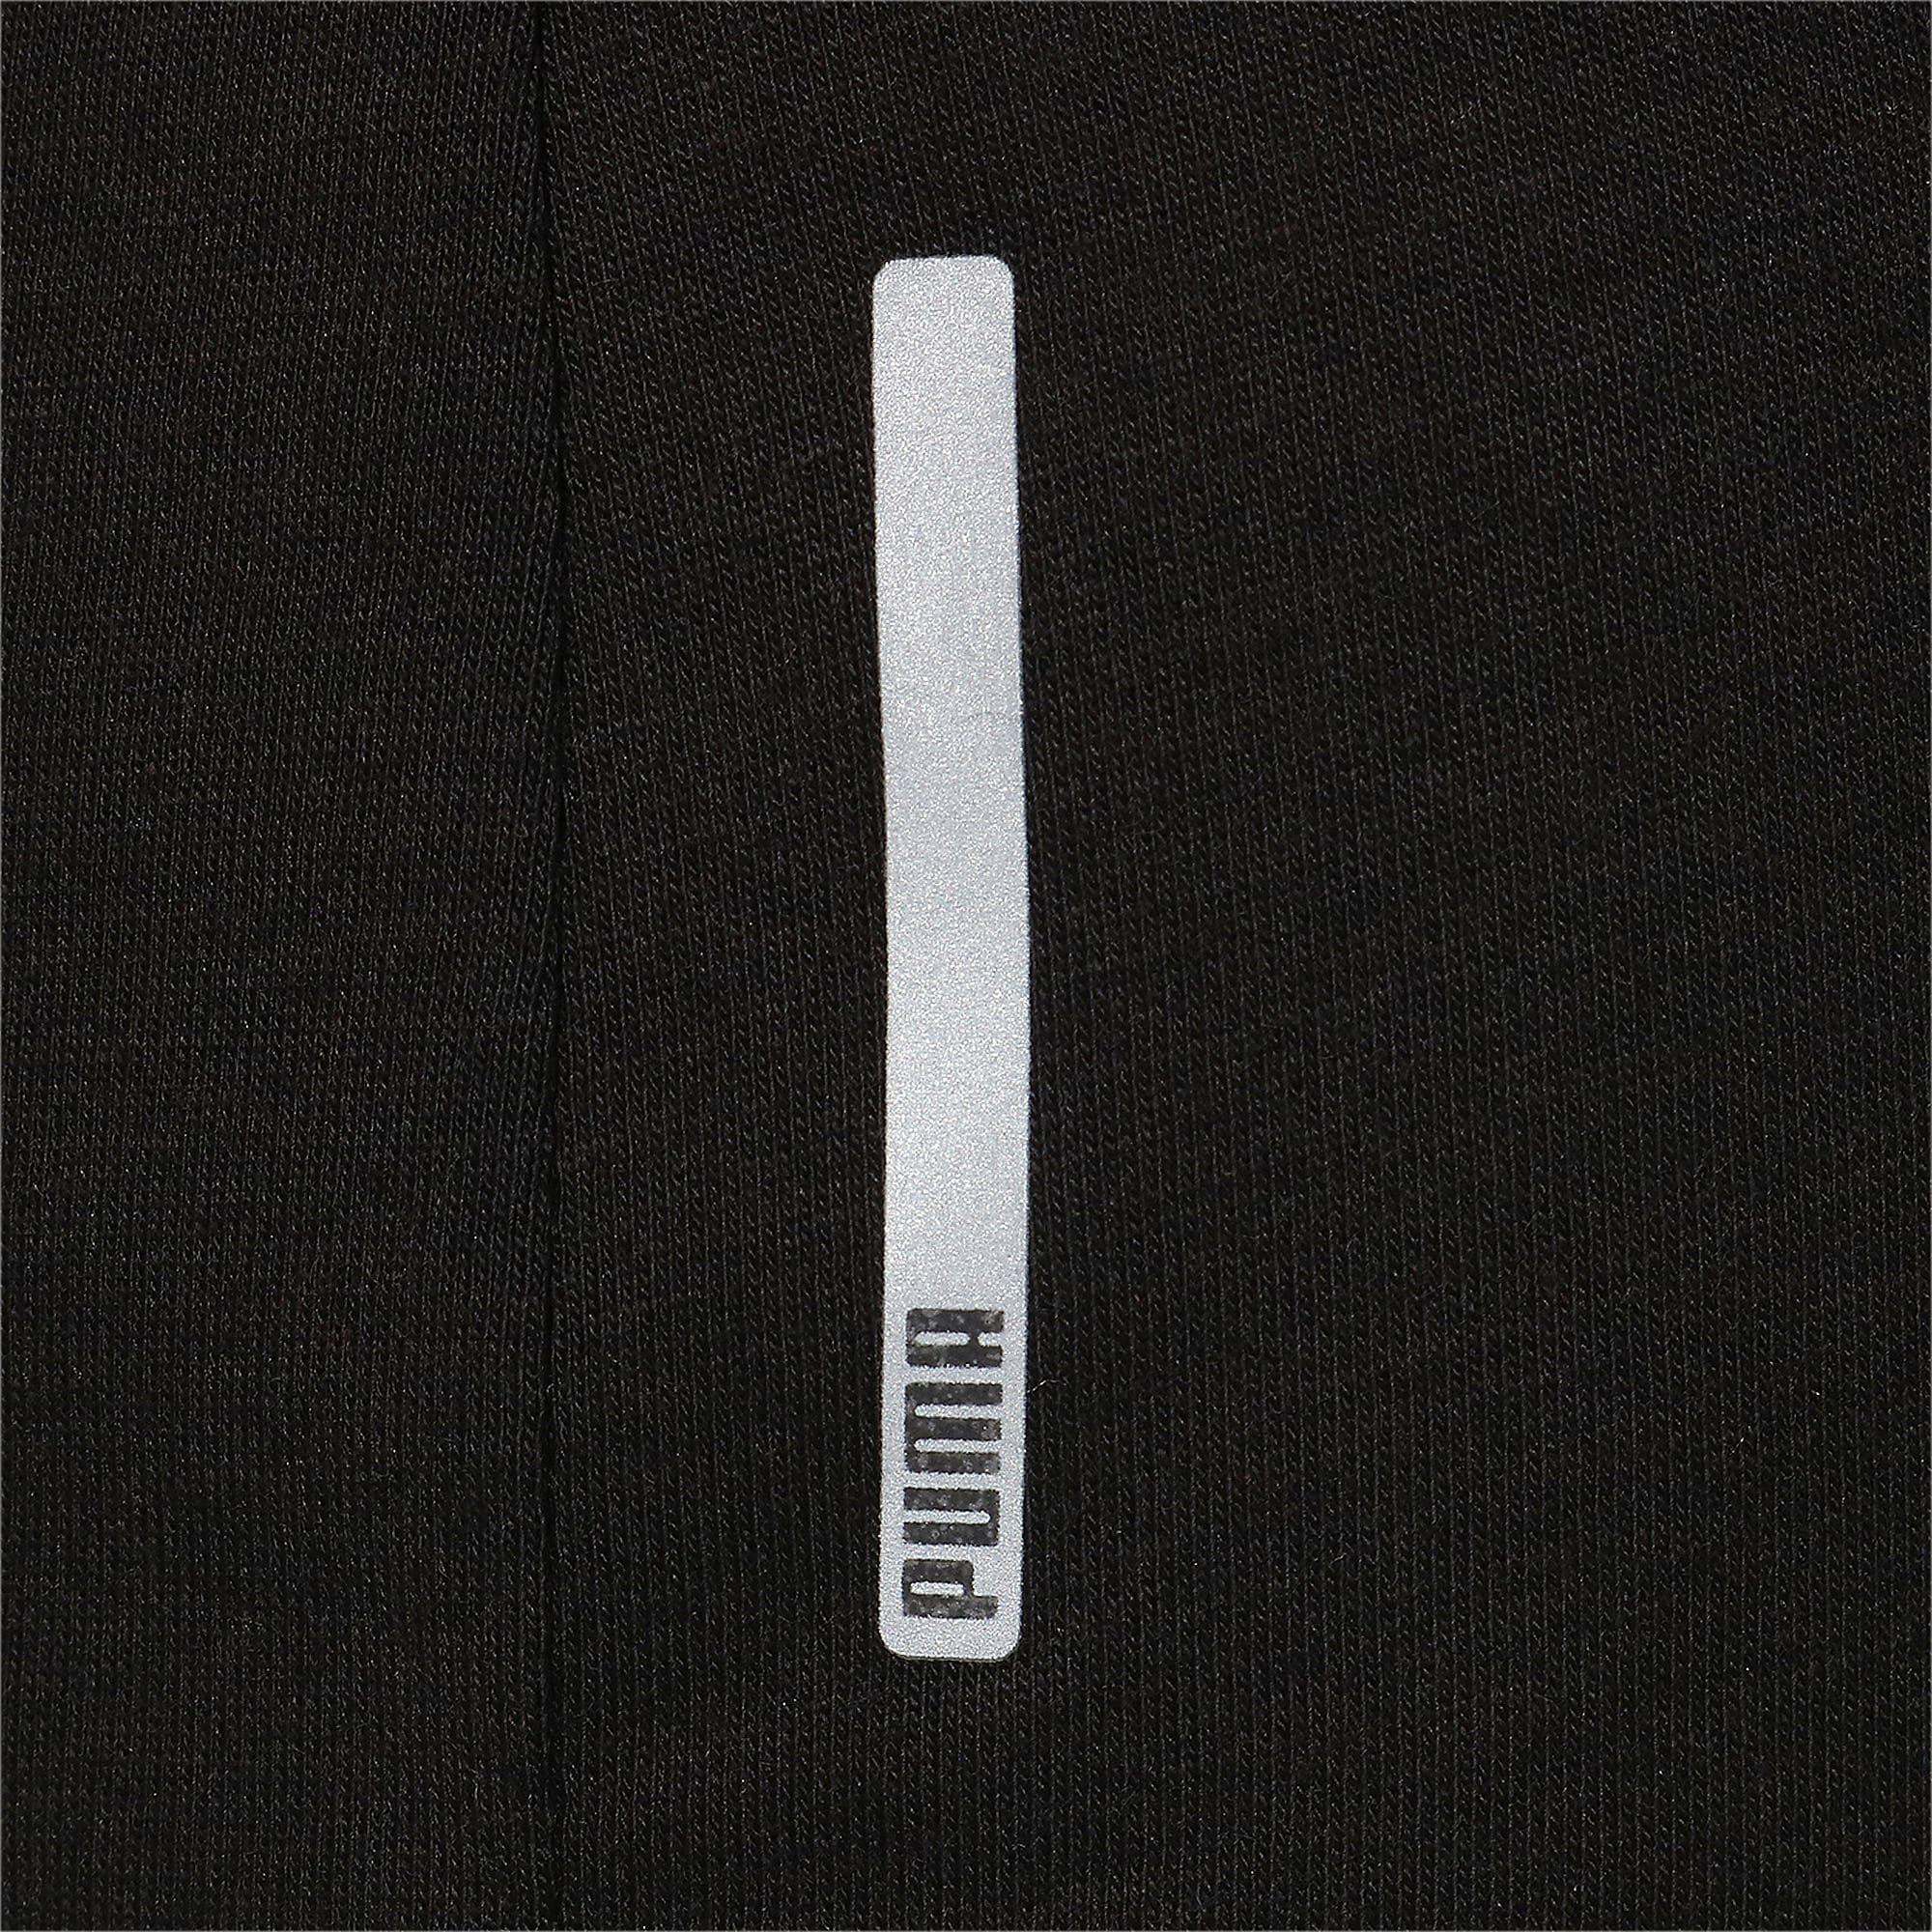 Thumbnail 10 of FAVORITE キャット SS ウィメンズ トレーニング Tシャツ 半袖, Puma Black-CAT Q3, medium-JPN